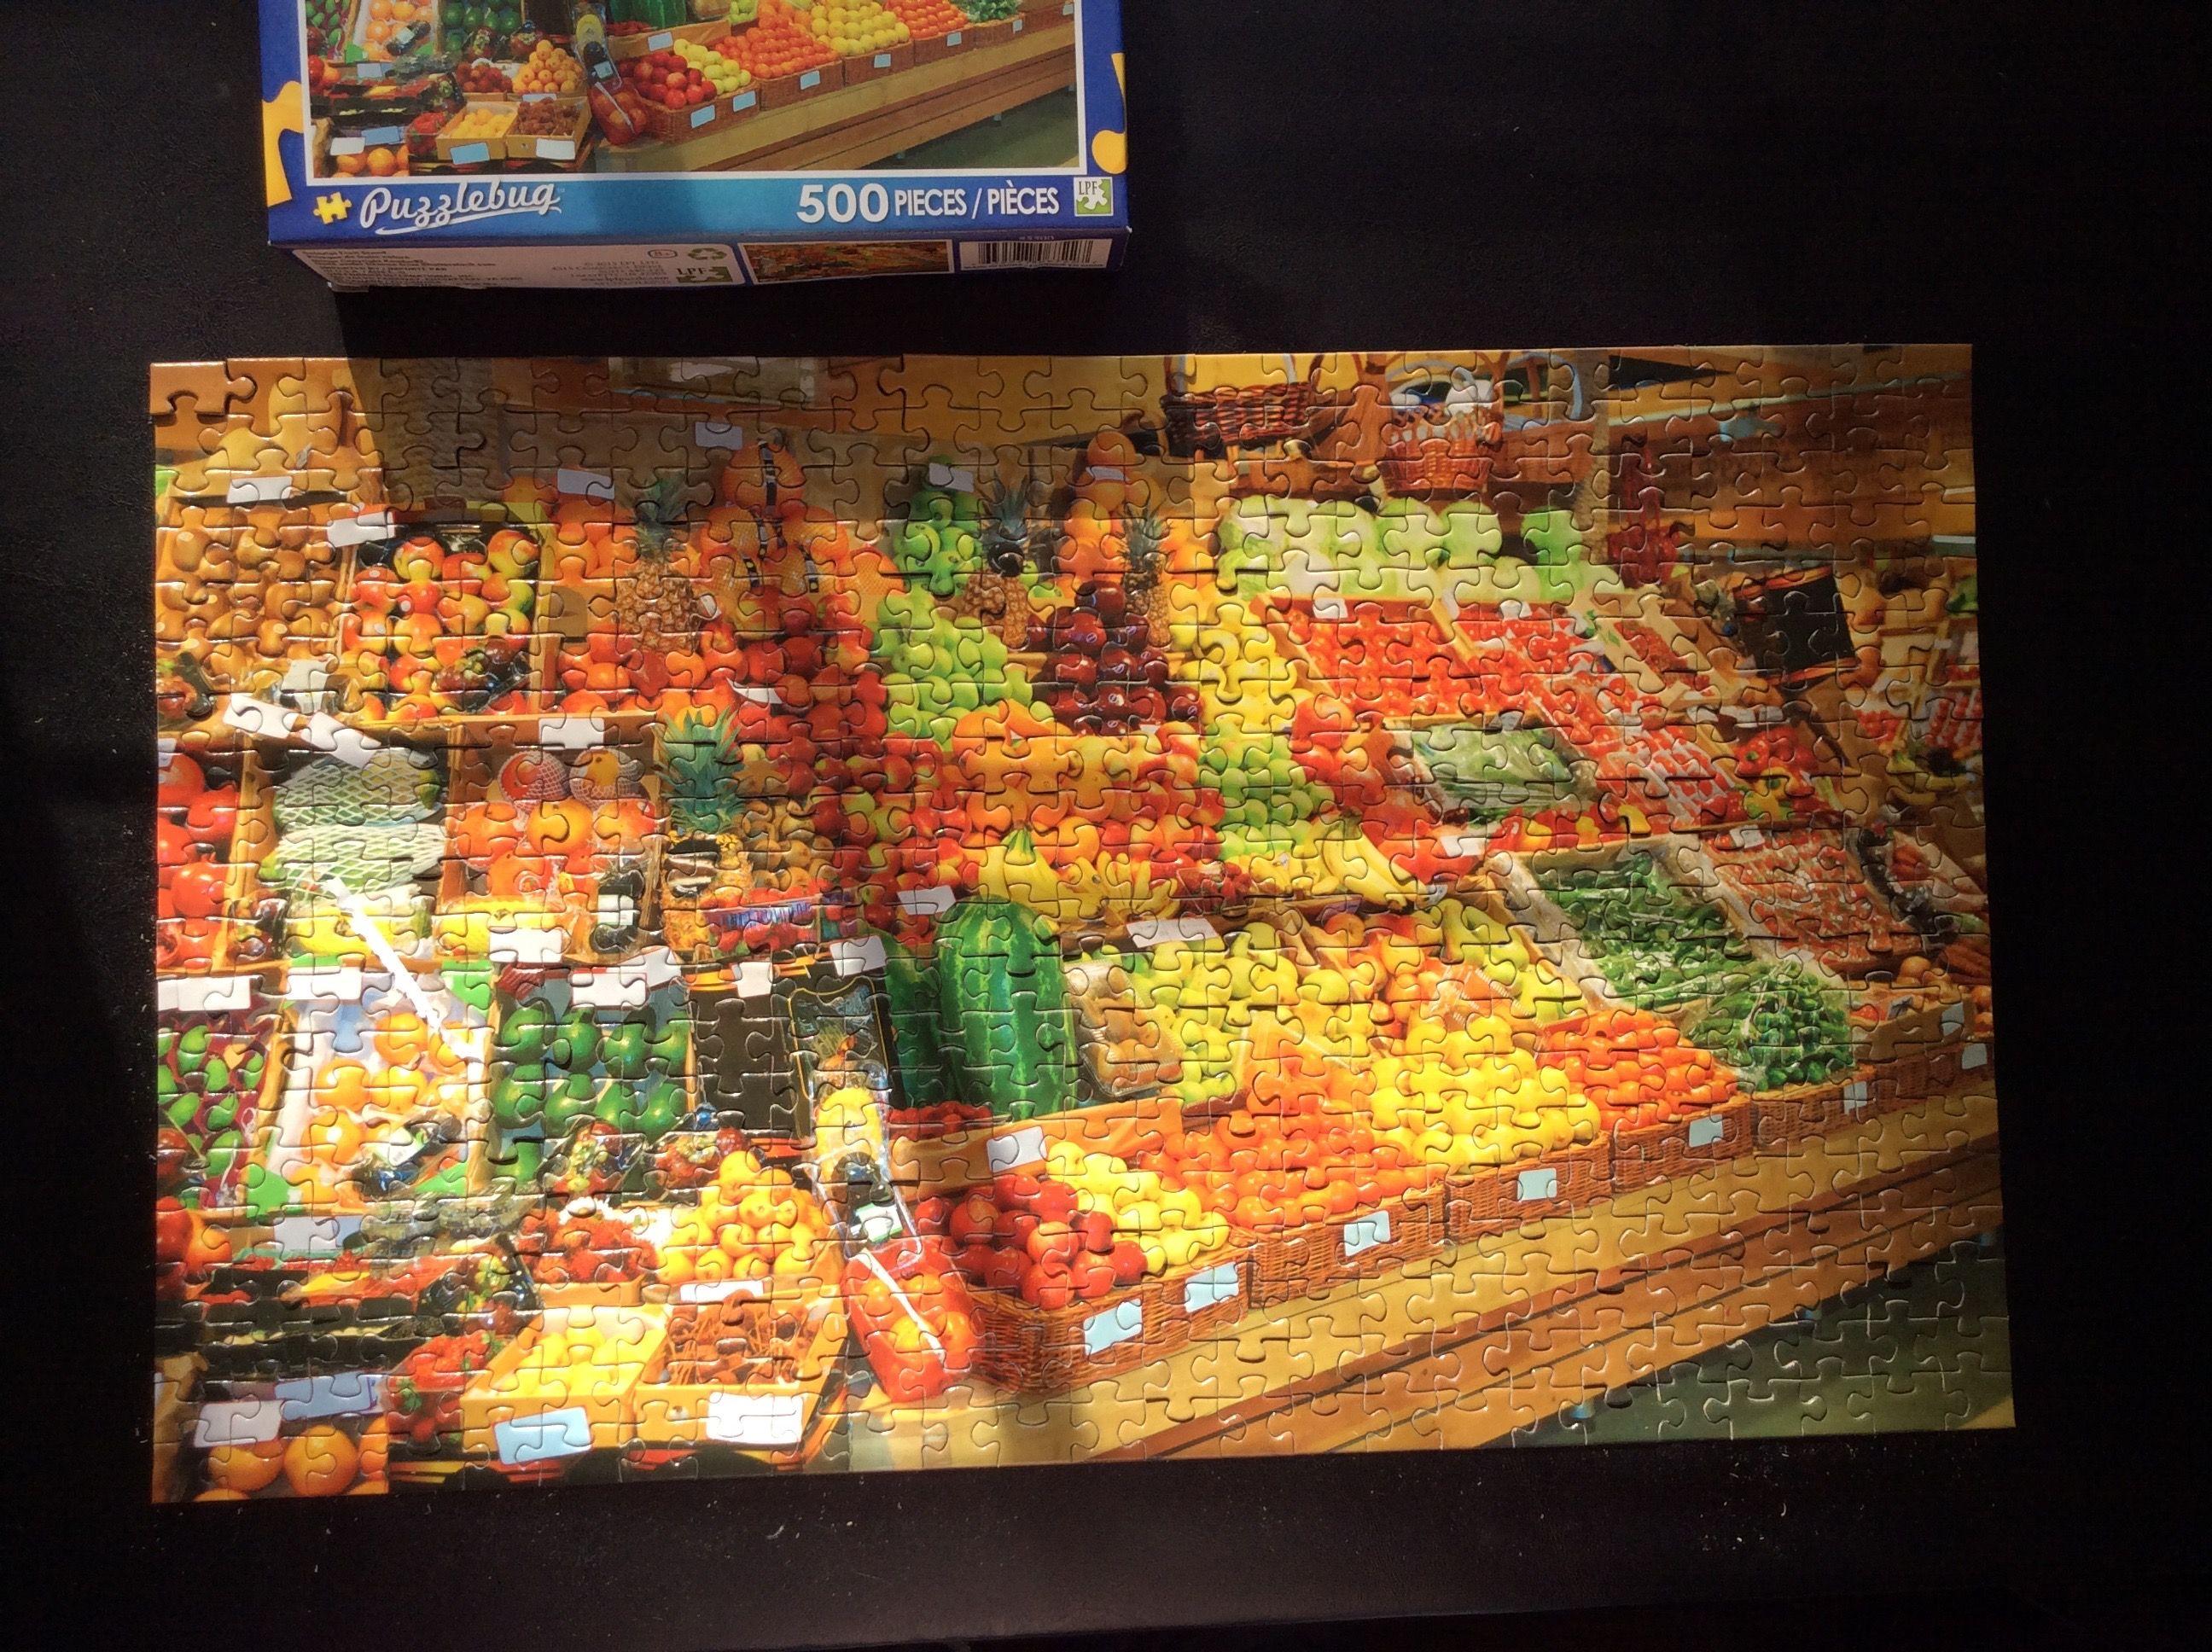 Puzzlebug 500 Piece Produce Supermarket Stand Puzzle